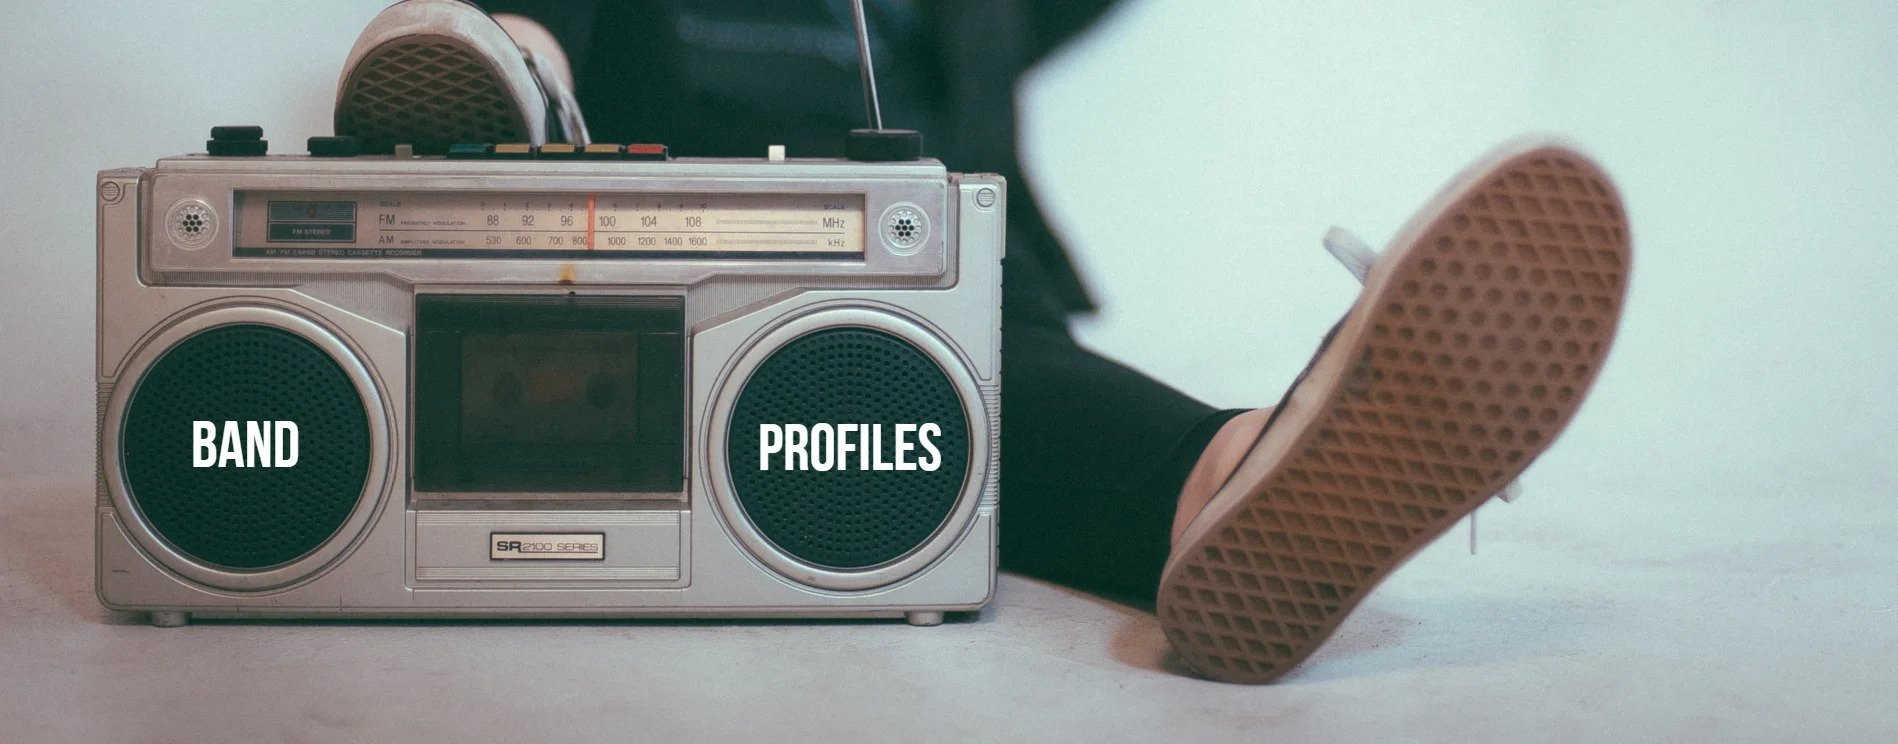 Band Profiles